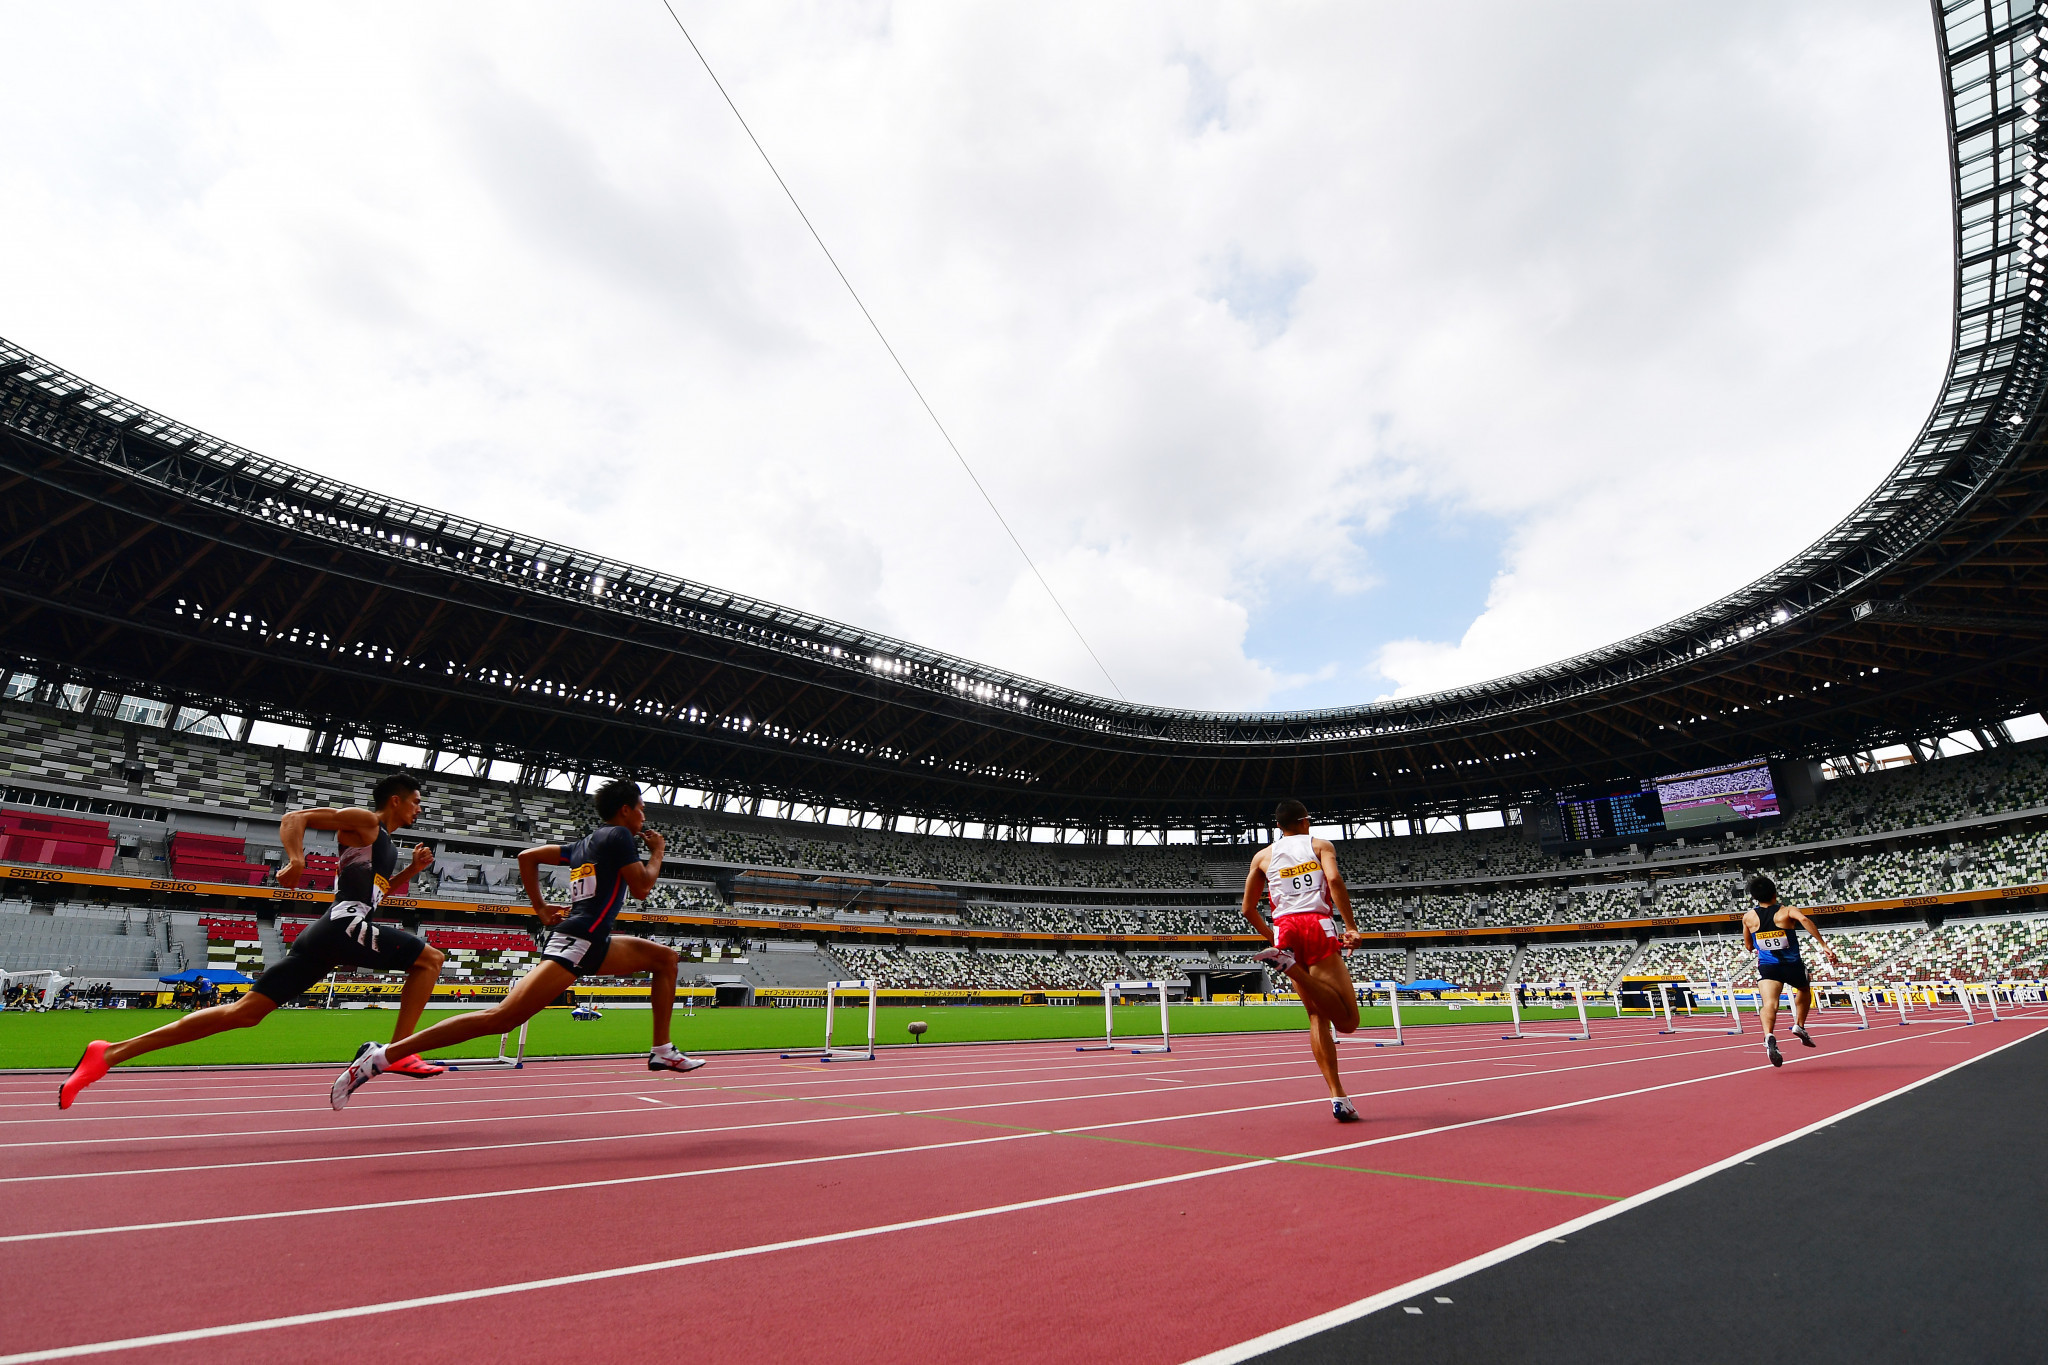 Poco probable que atletas extranjeros compitan en prueba Continental Tour para Tokio 2020